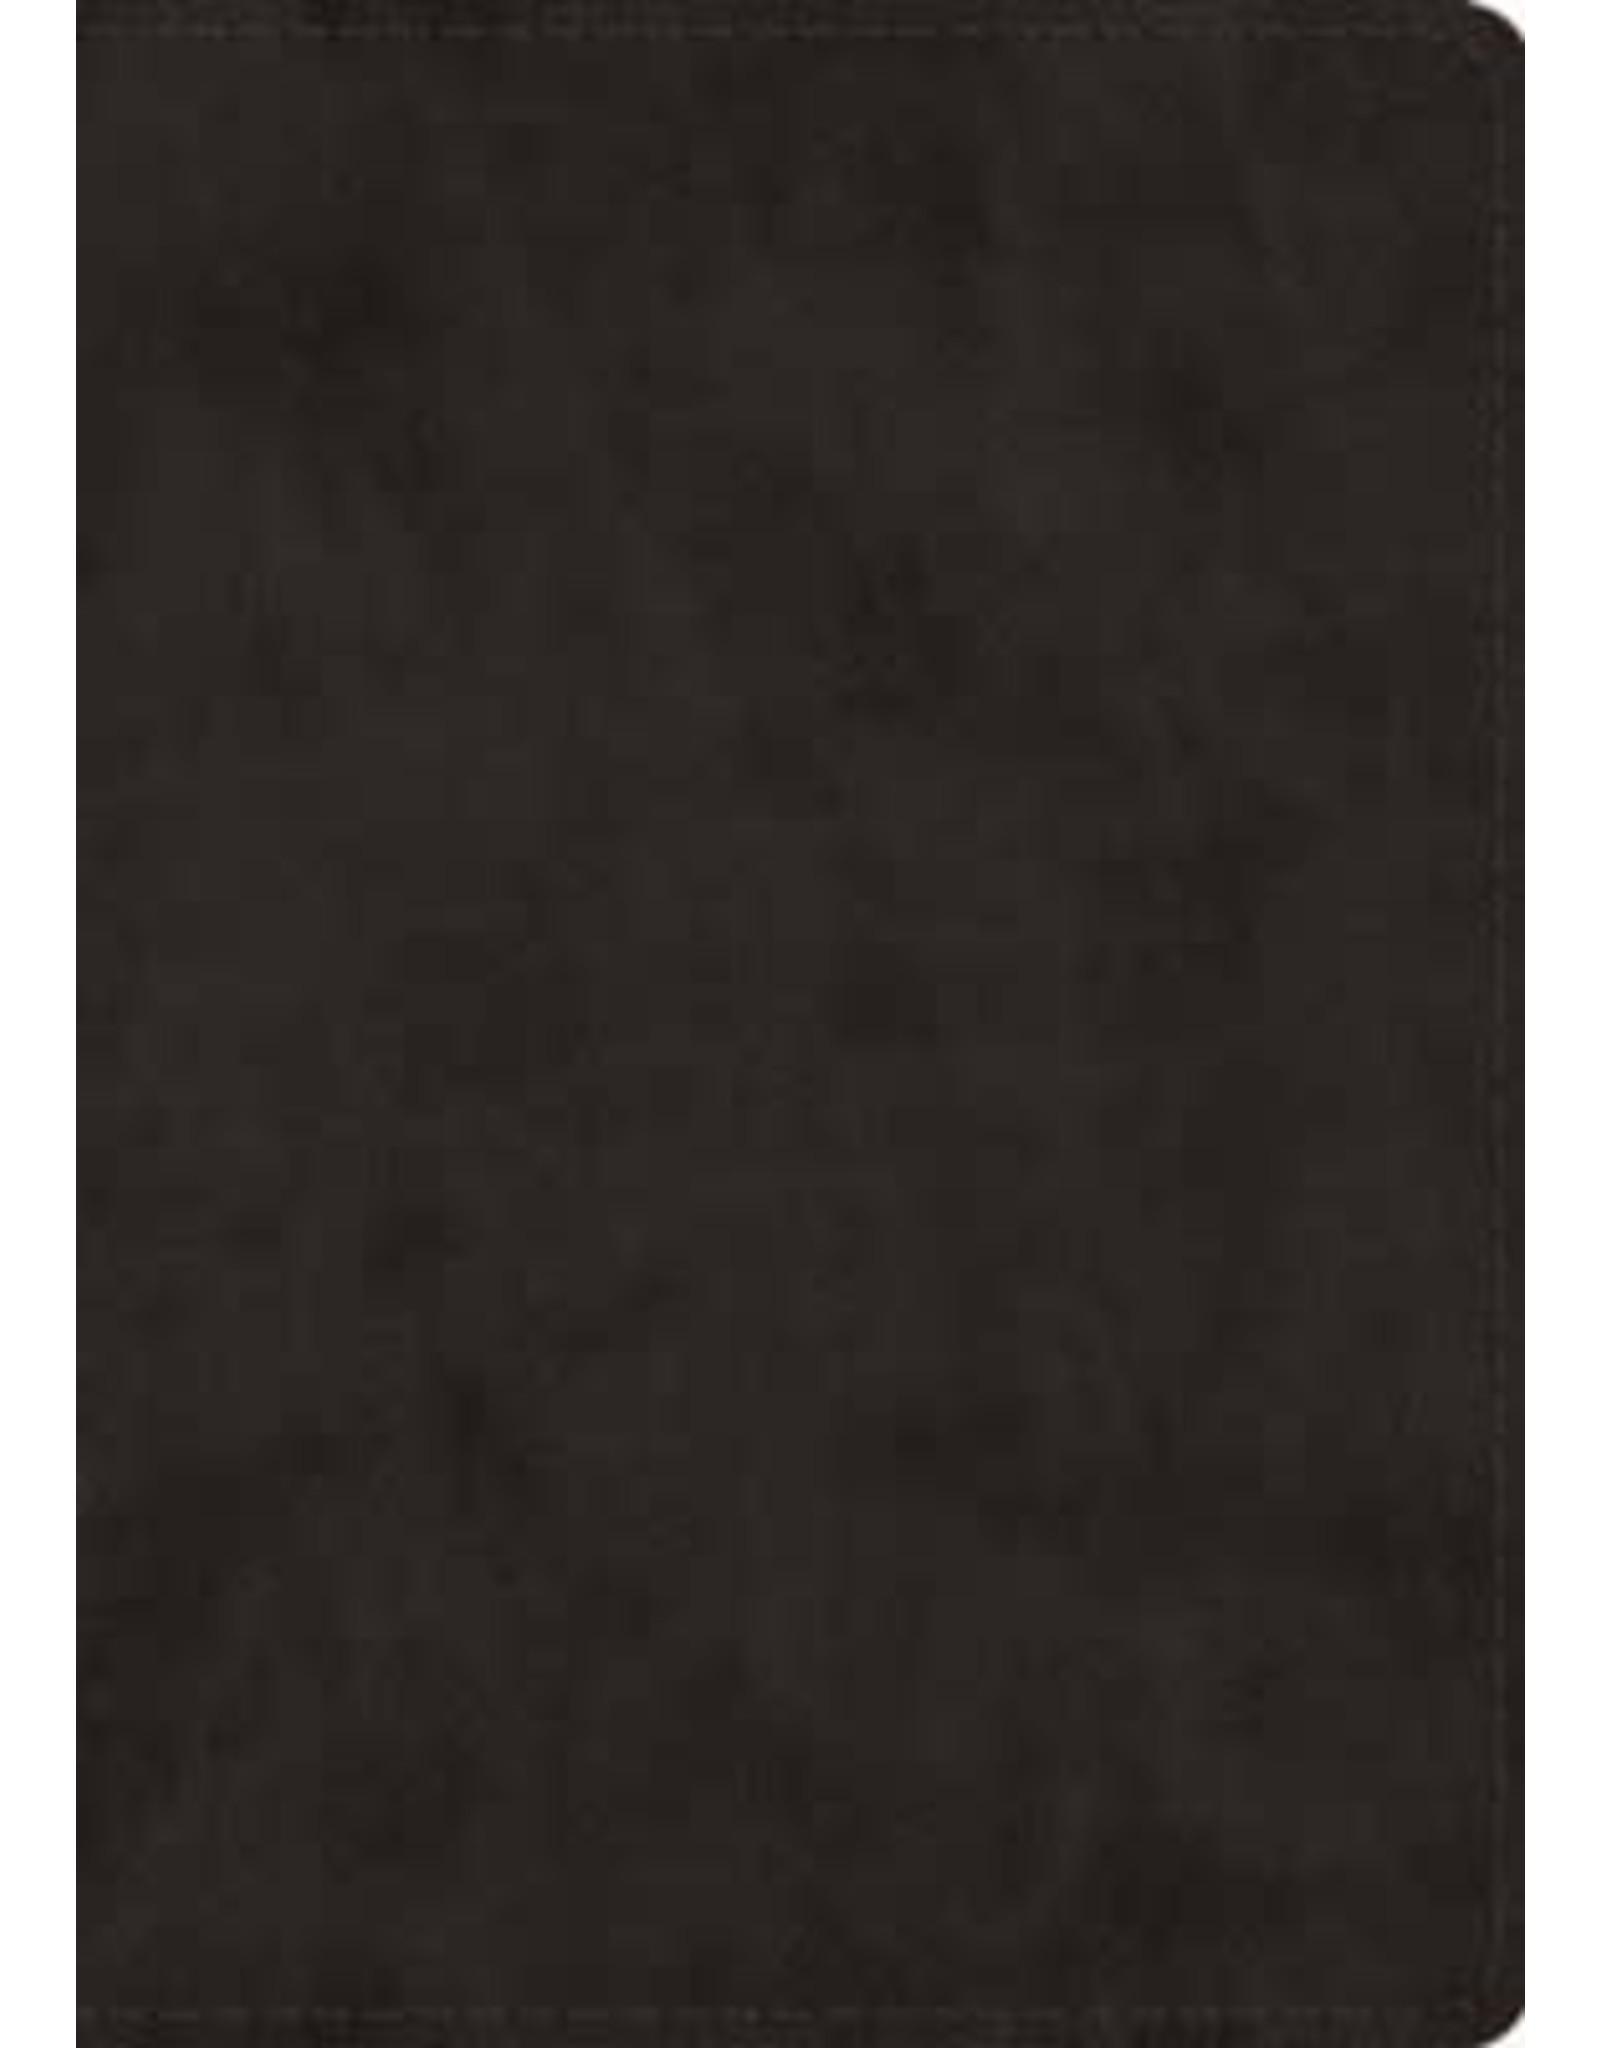 ESV large print black